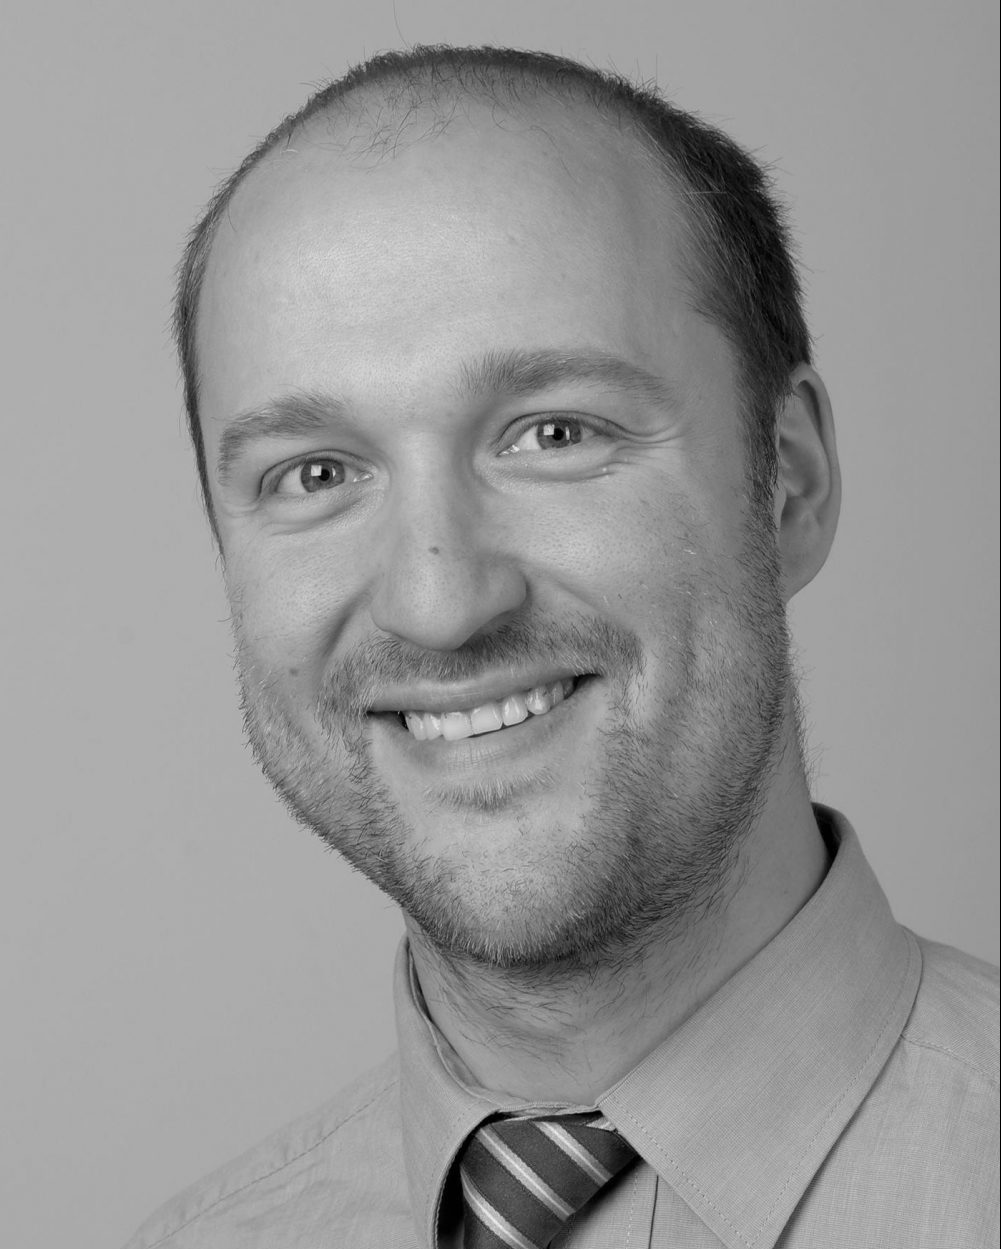 Micha Profilbild schwarz weiß - PolyRadar